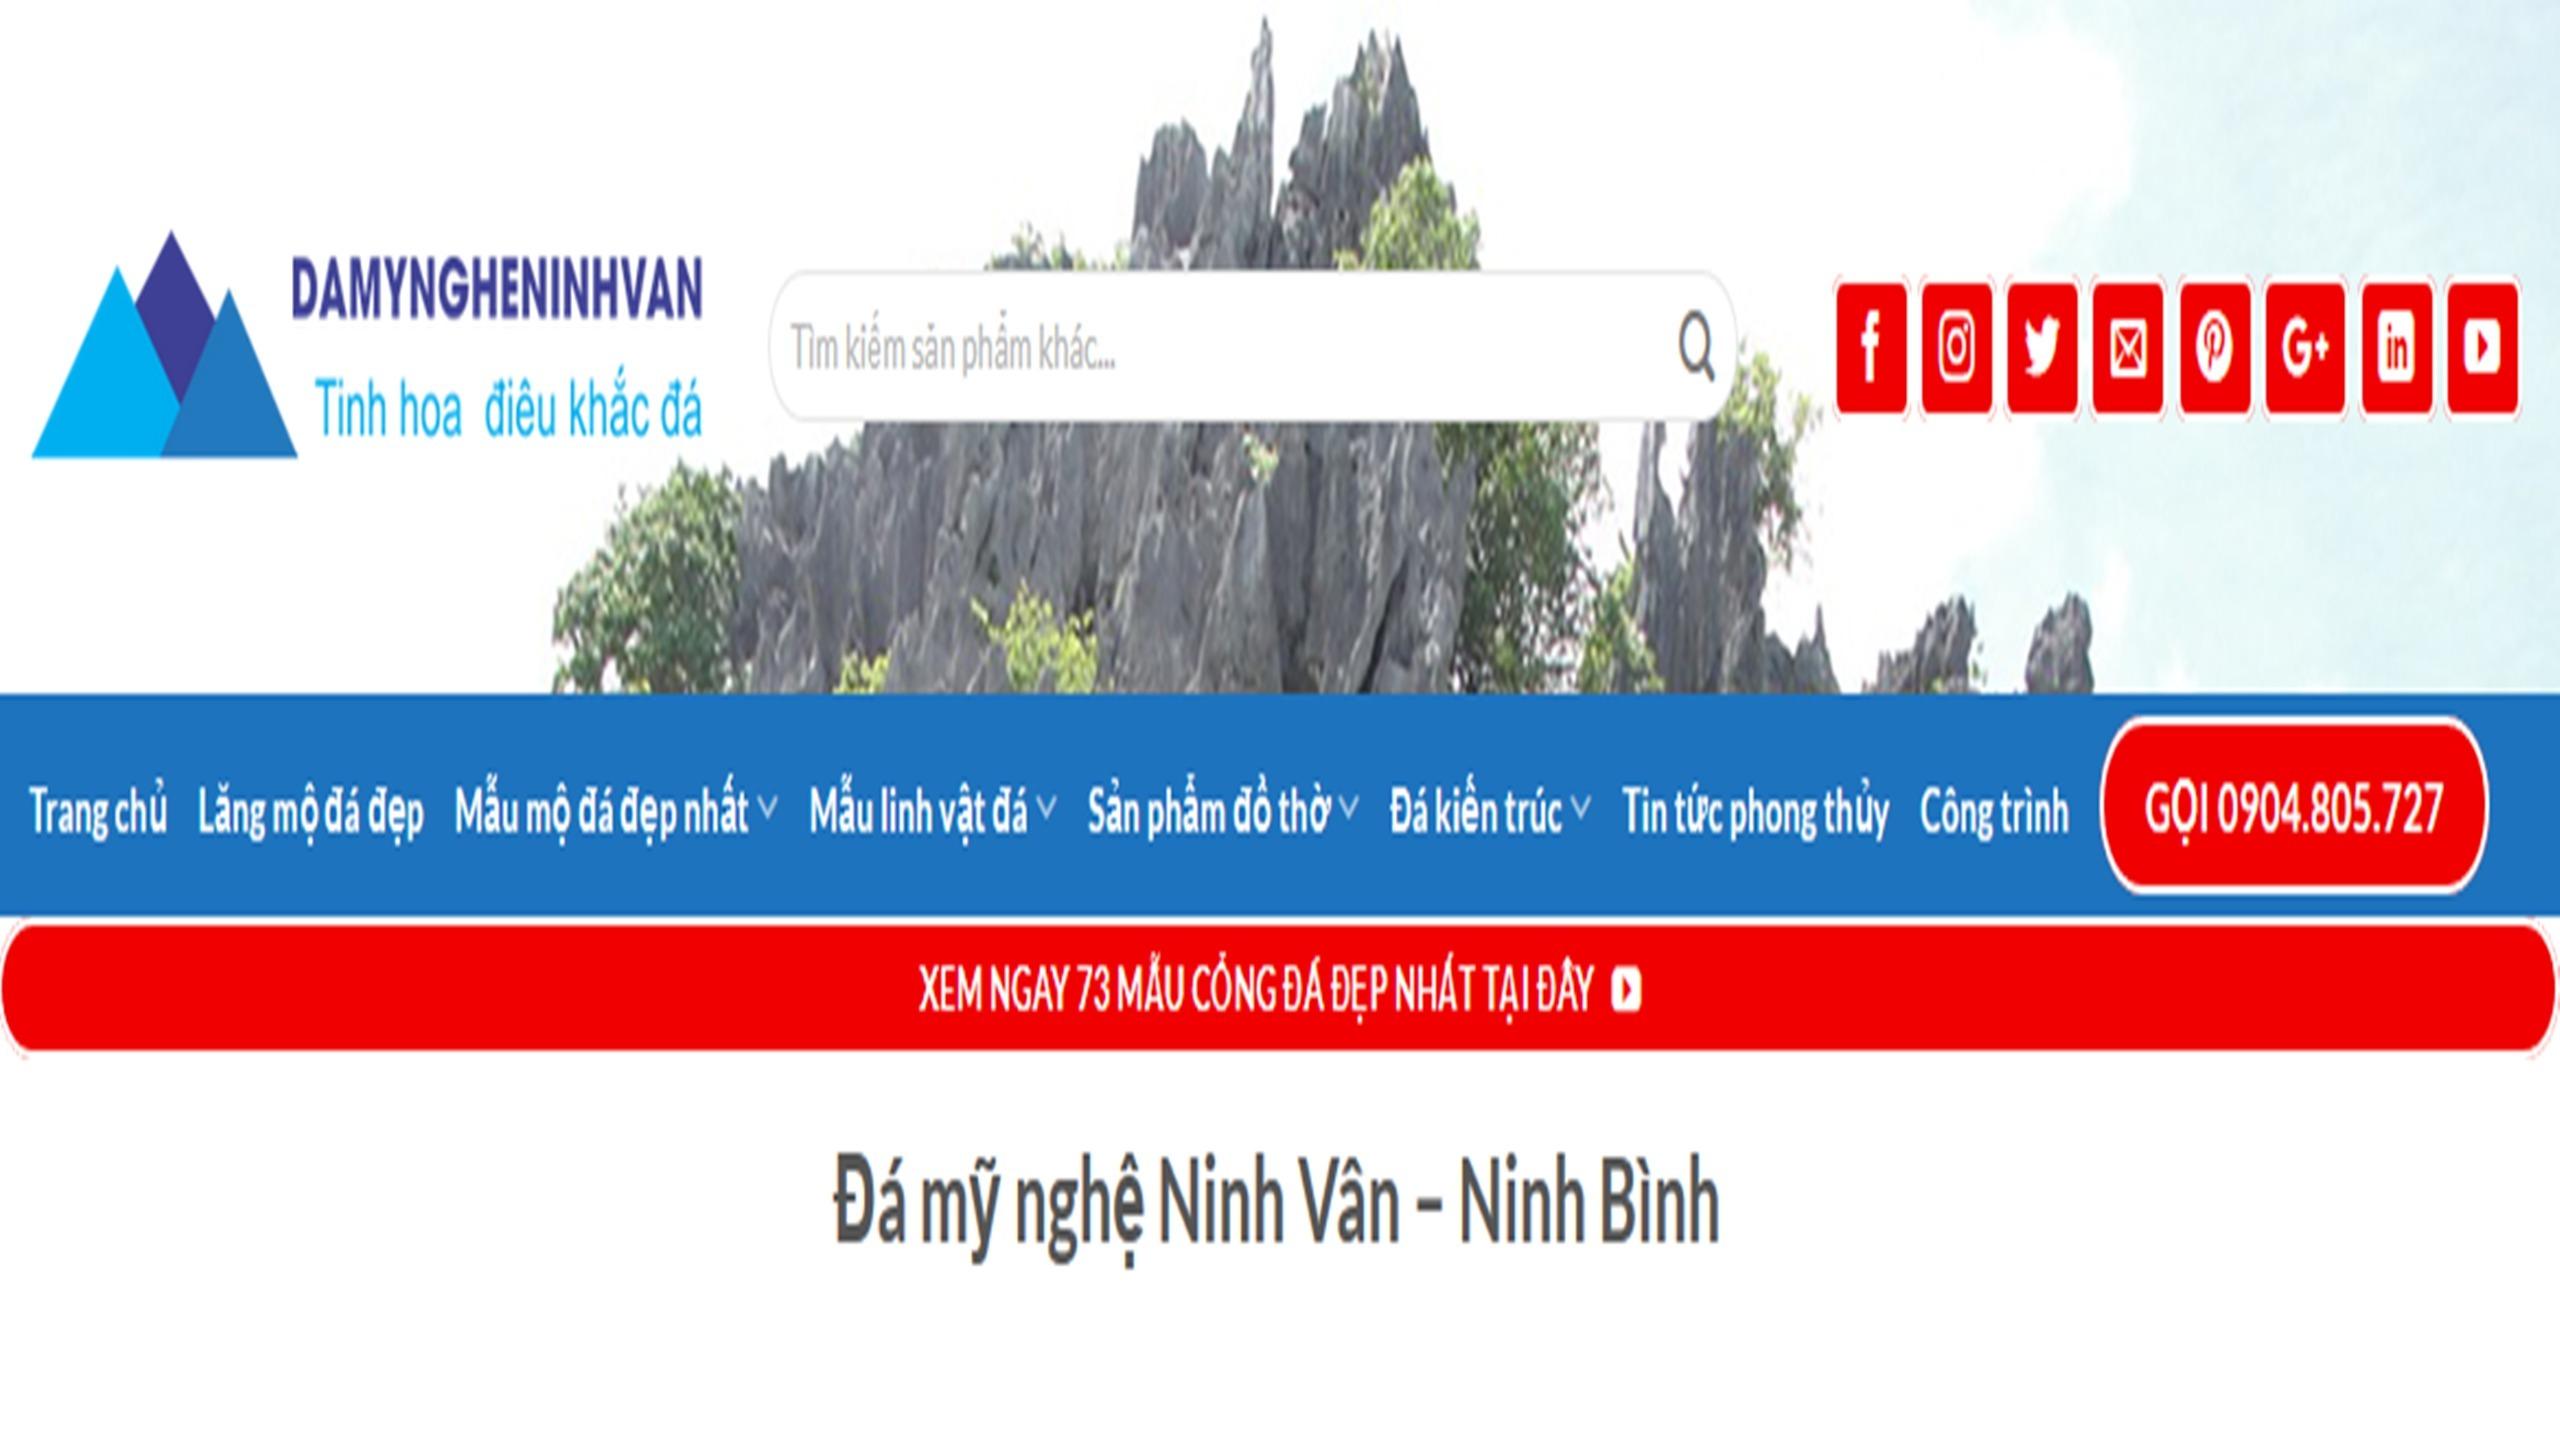 Dieukhacdaninhvan (@dieukhacdaninhvan) Cover Image